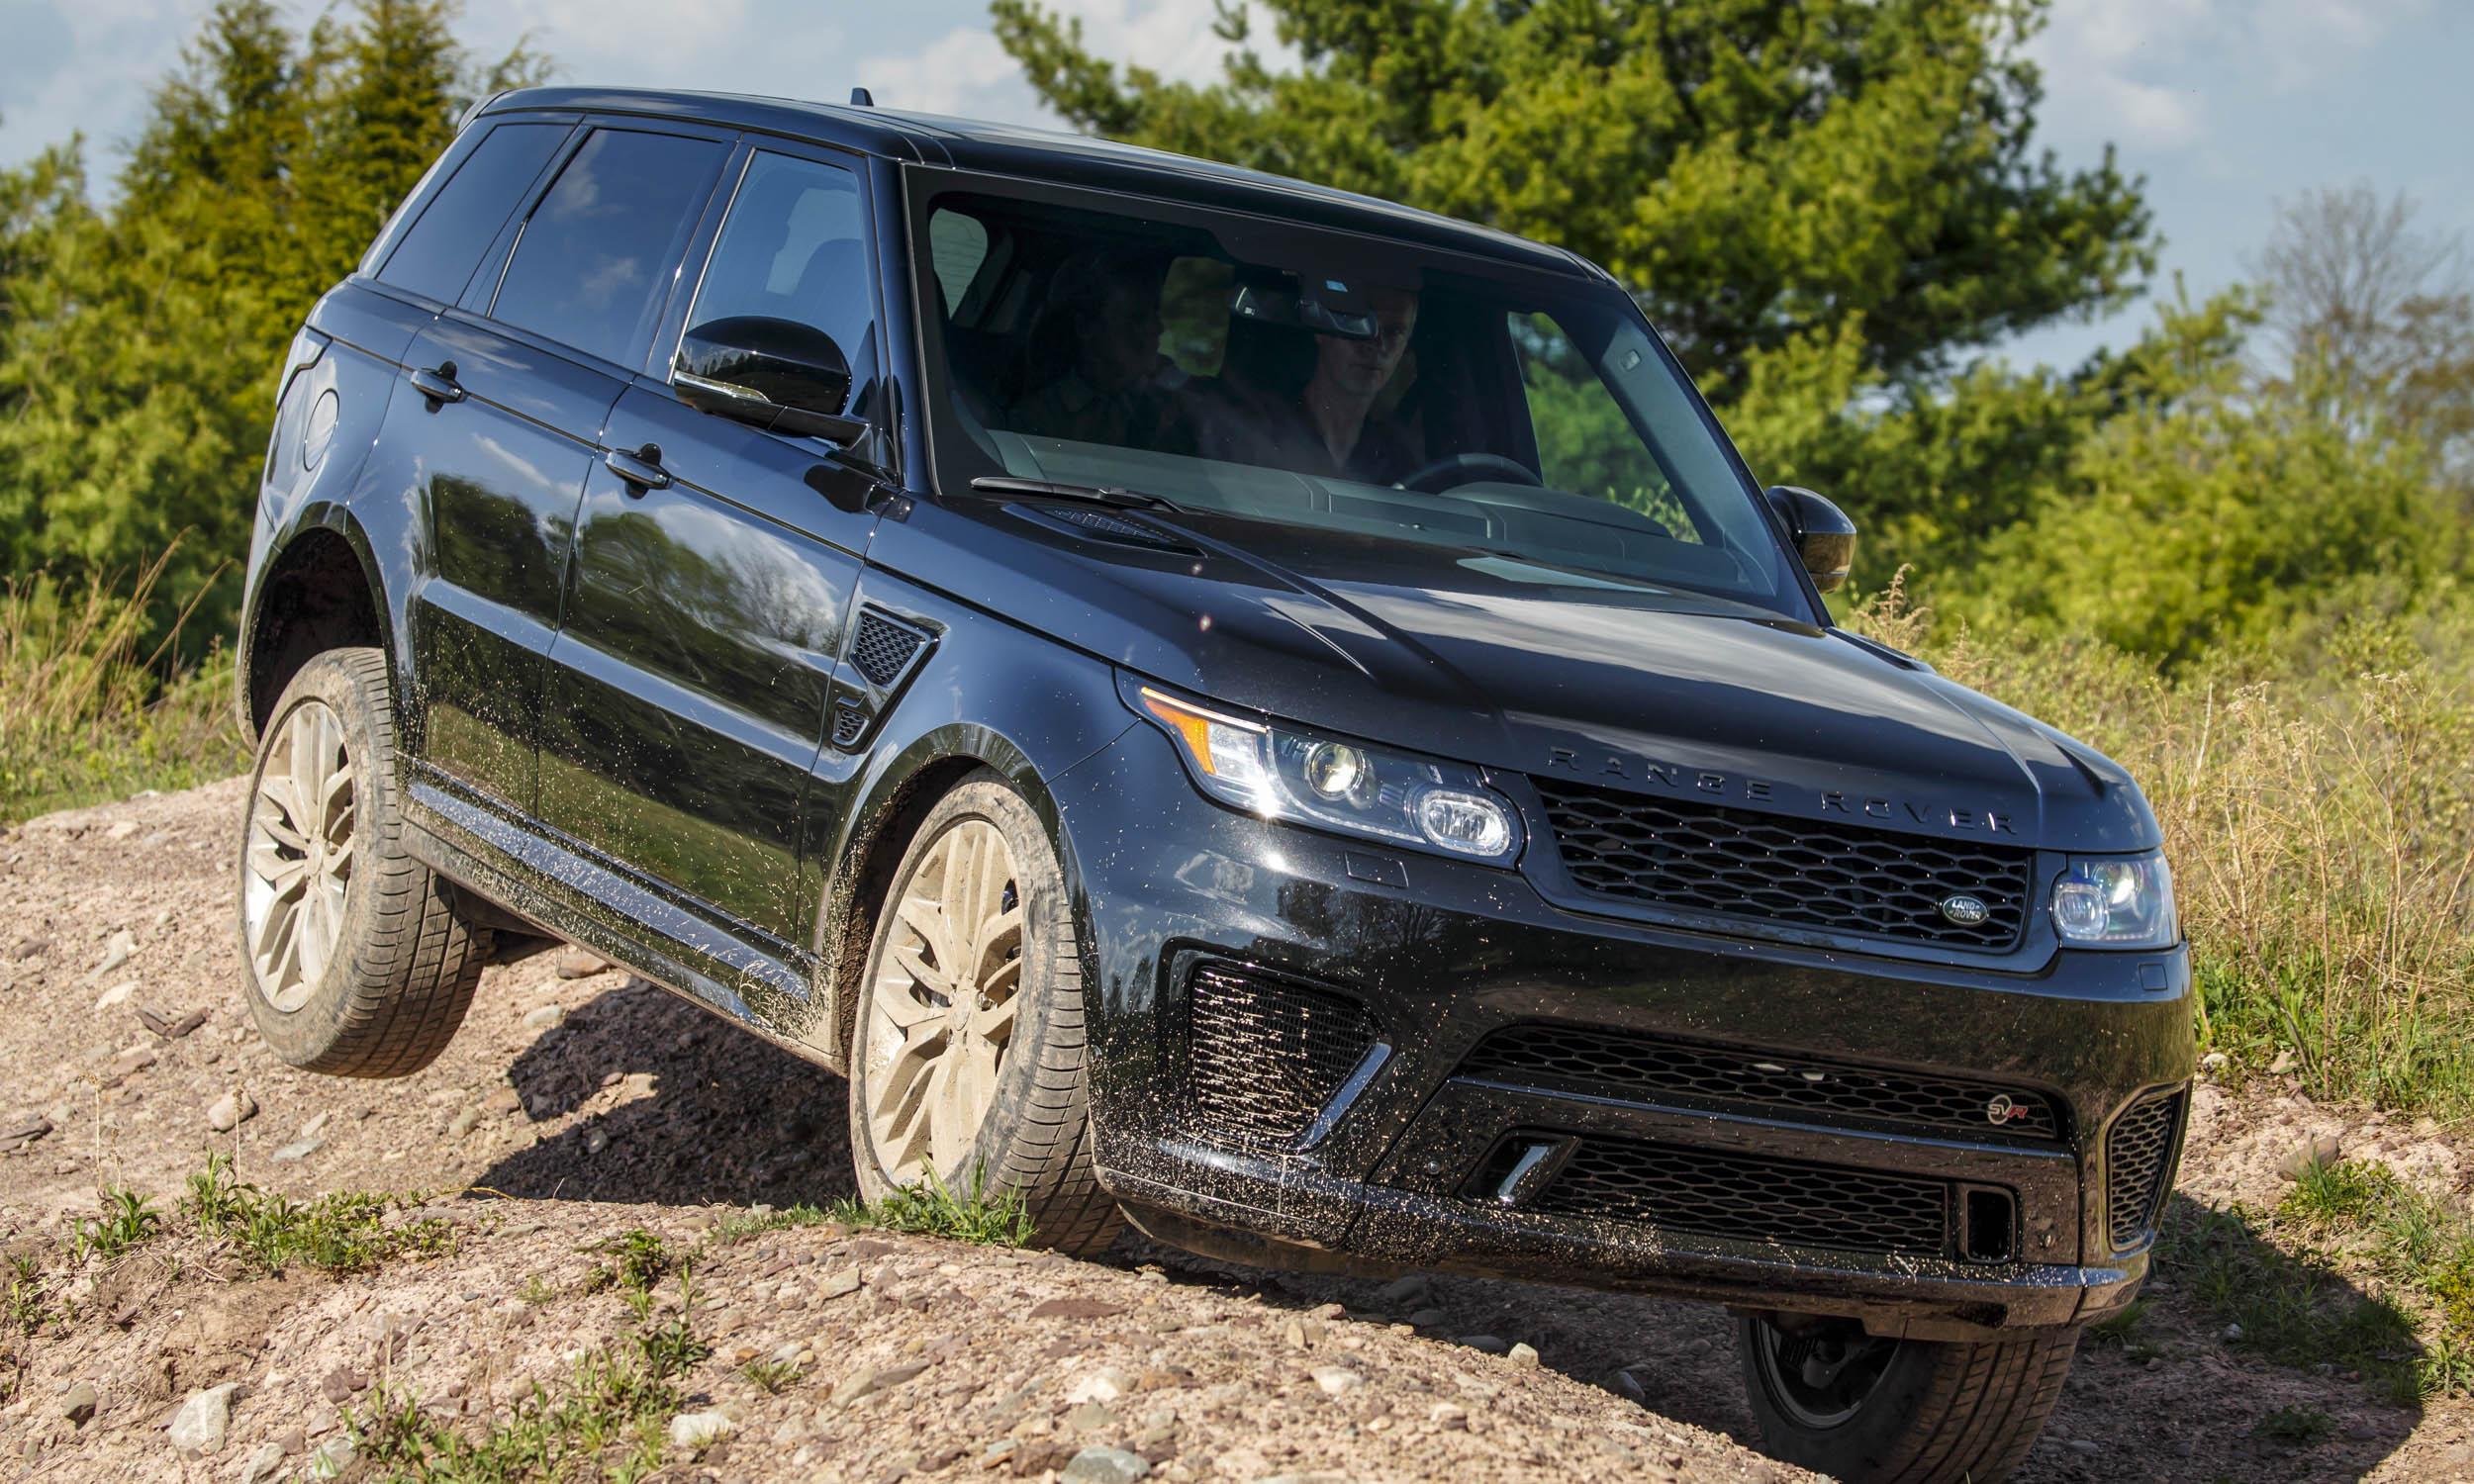 2015 land rover range rover sport svr first drive review. Black Bedroom Furniture Sets. Home Design Ideas